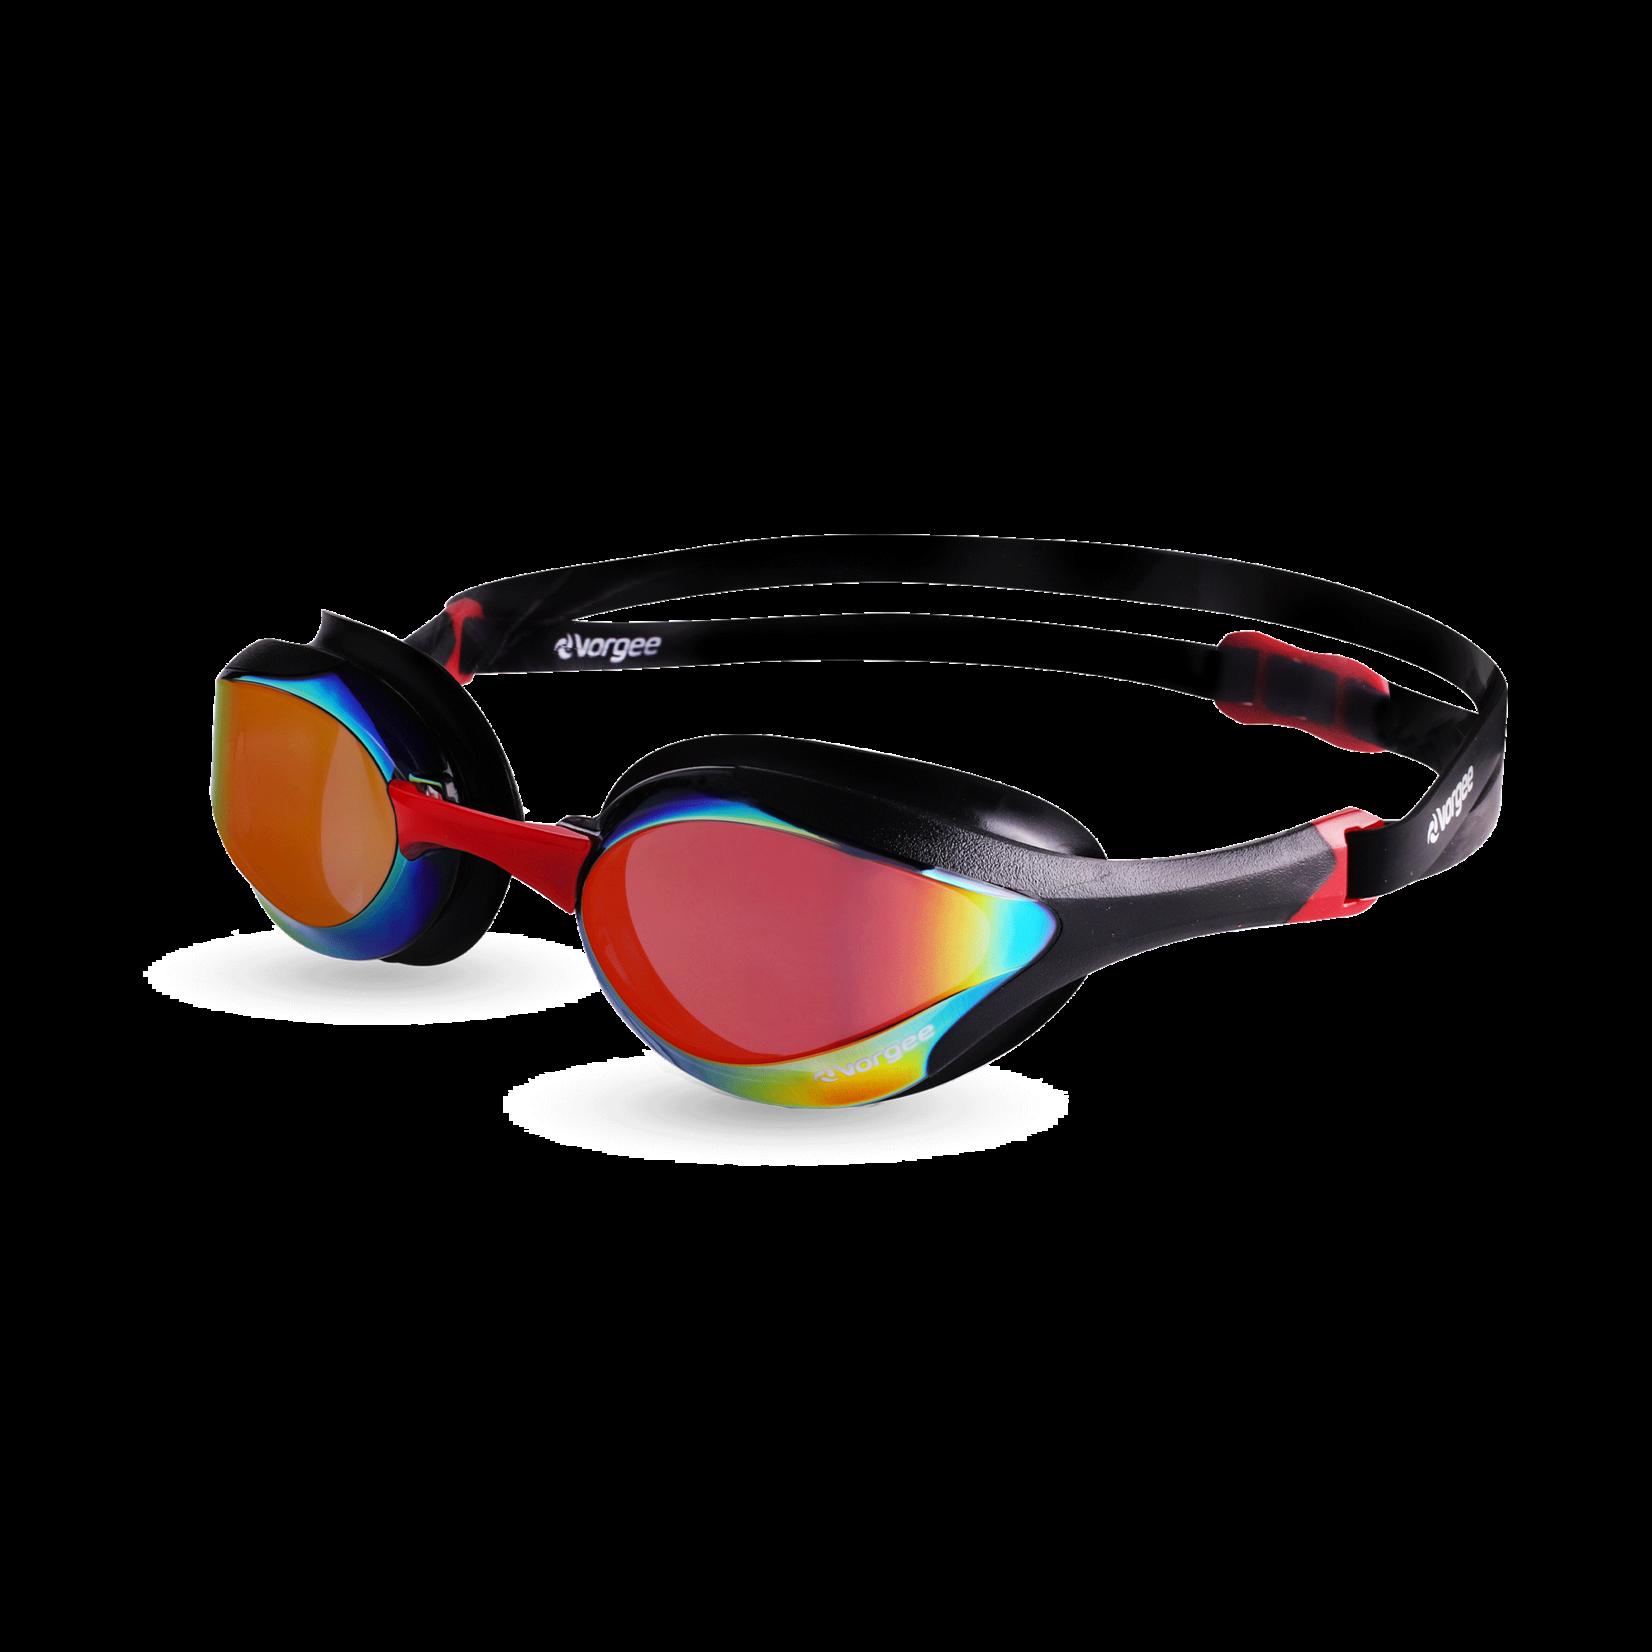 Vorgee Stealth MKII Mirrored Lens